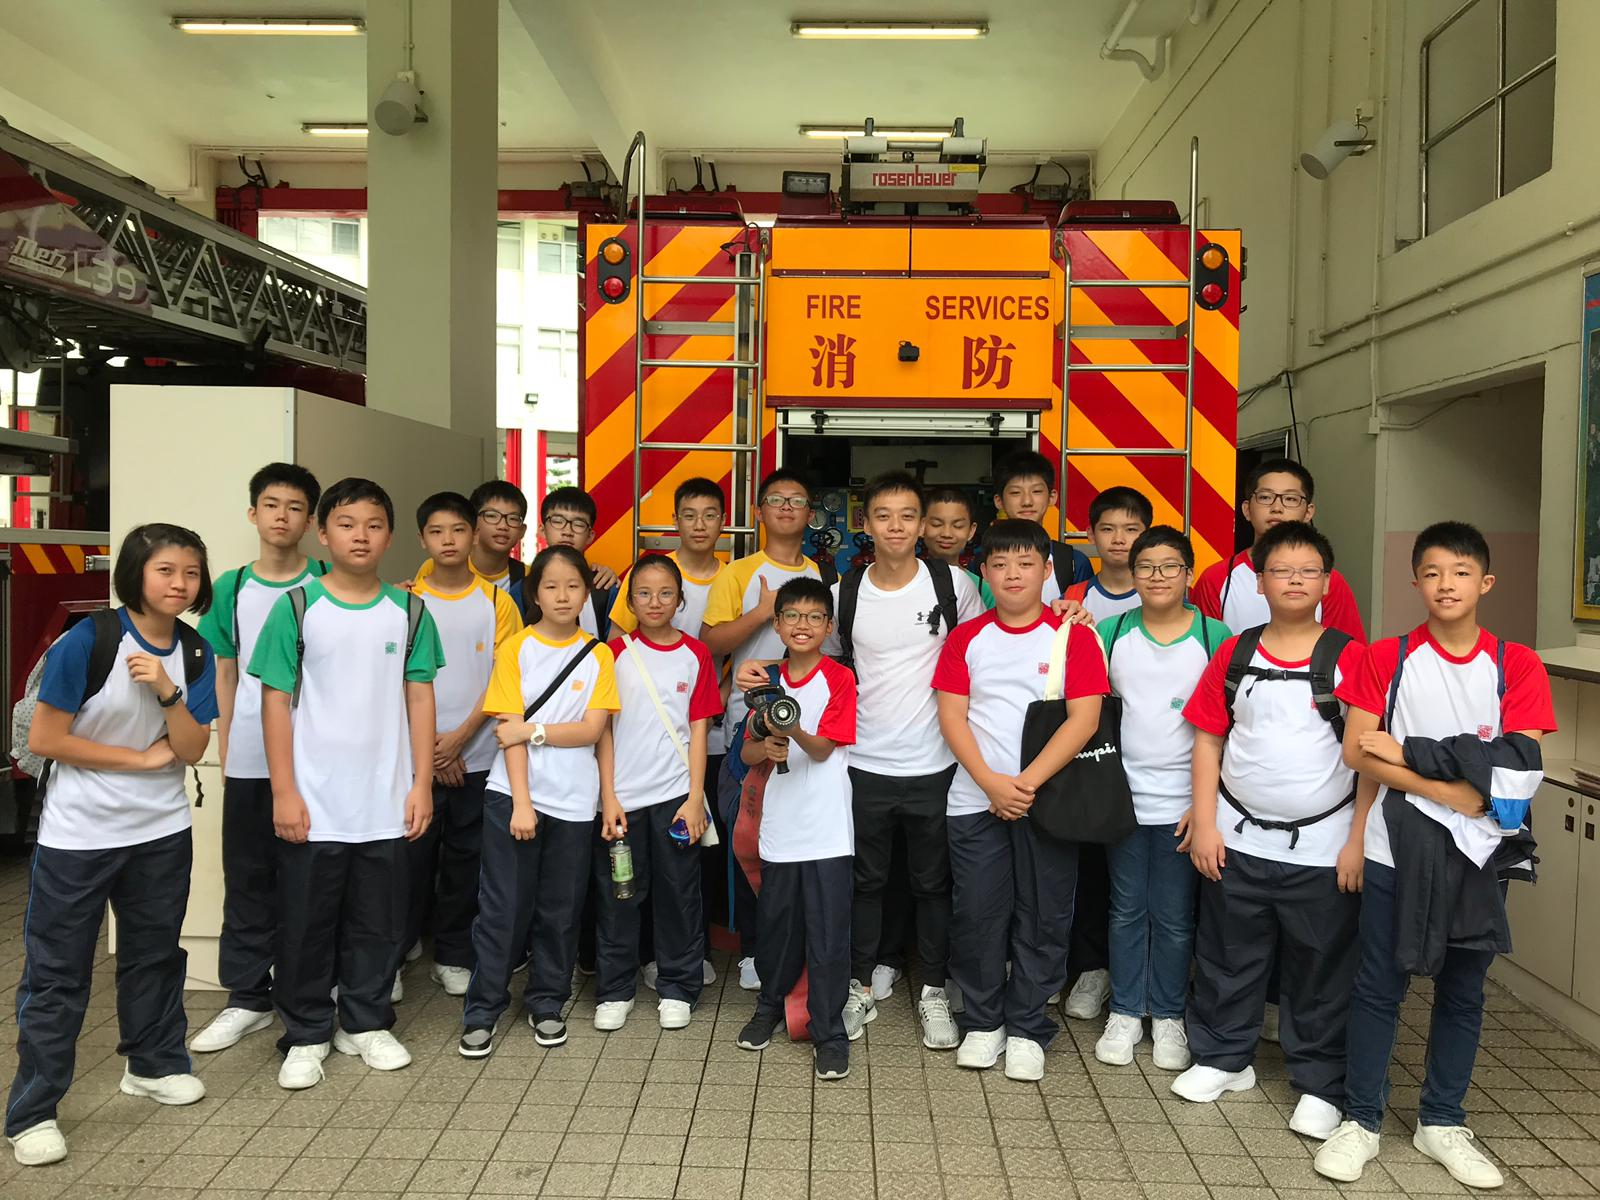 http://npc.edu.hk/sites/default/files/img-20190716-wa0010.jpg